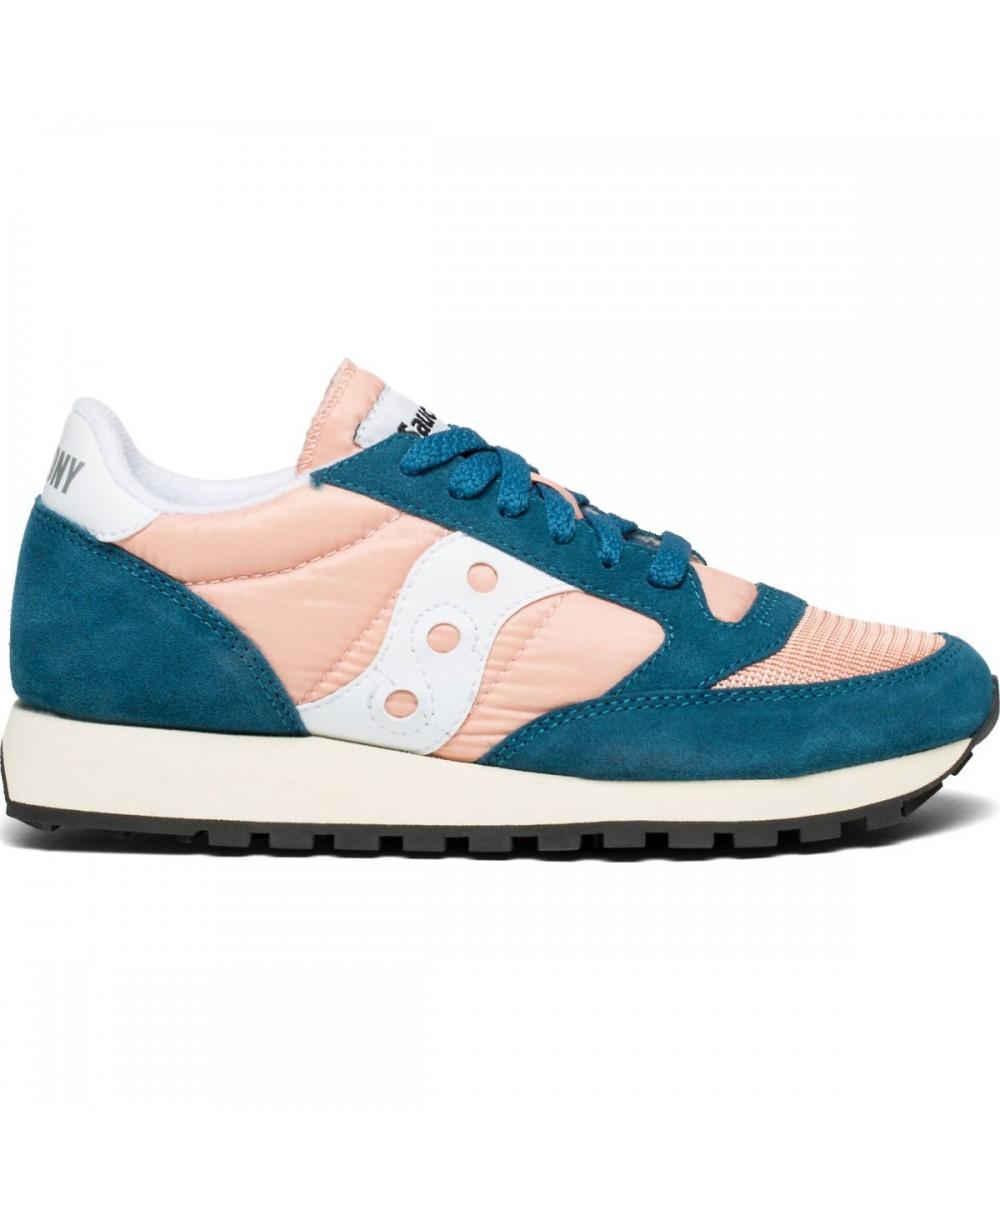 Mujer Zapatos Saucony Para Vintage Original Jazz Tealpeach Sneakers wqqxYRta4